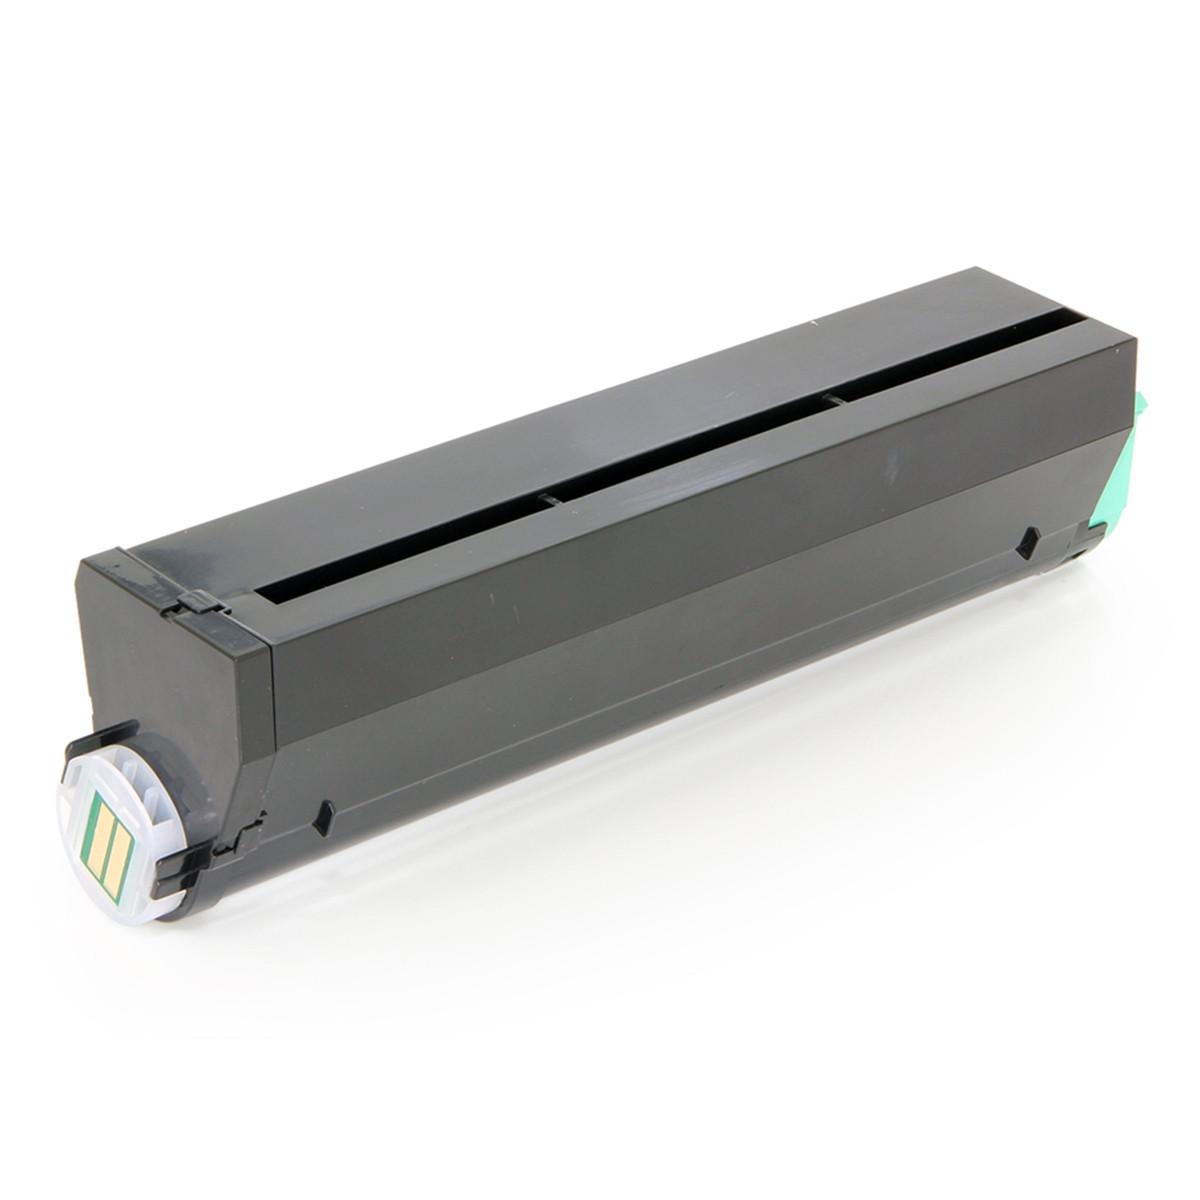 Toner Compatível com Okidata B410 B420 B430 B440 MB460 MB470 MB440 MB480 | Premium 7k